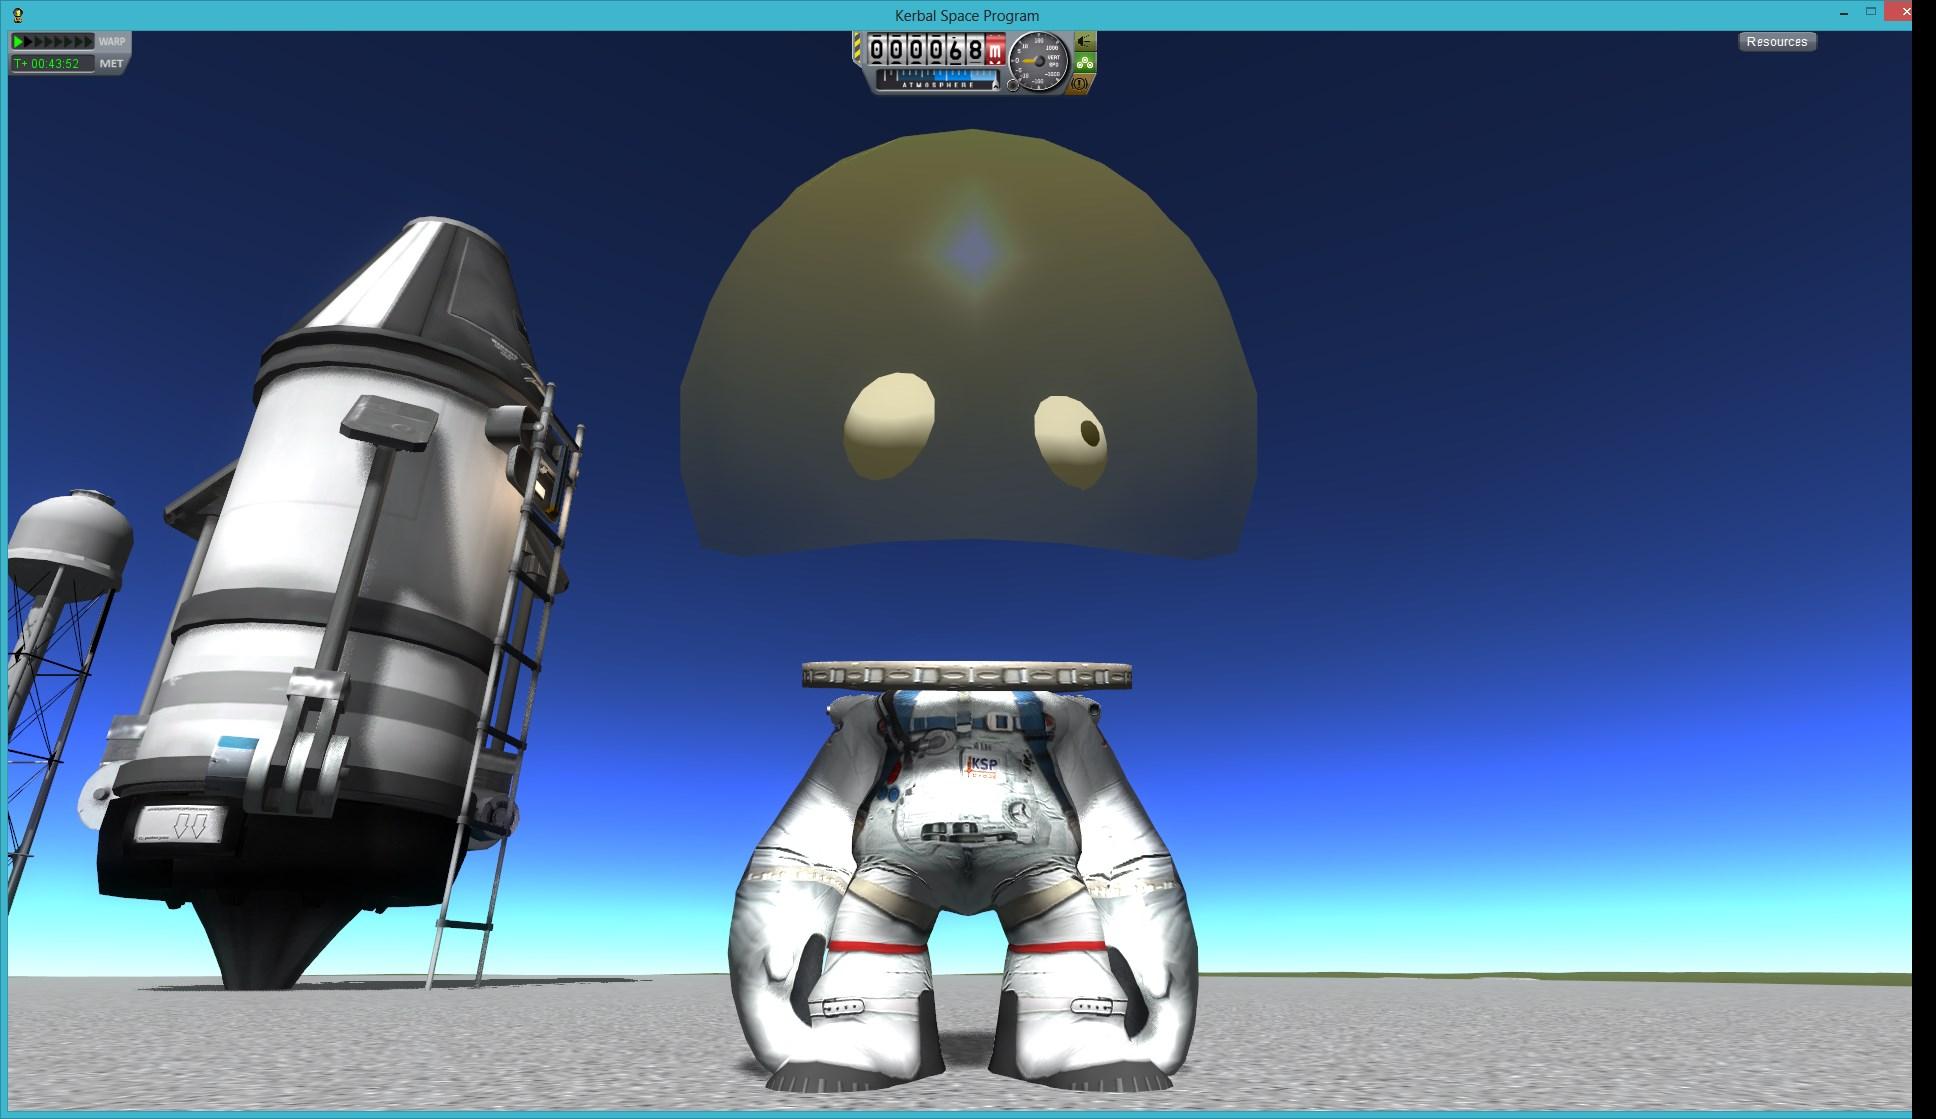 kerbal space program face - photo #31